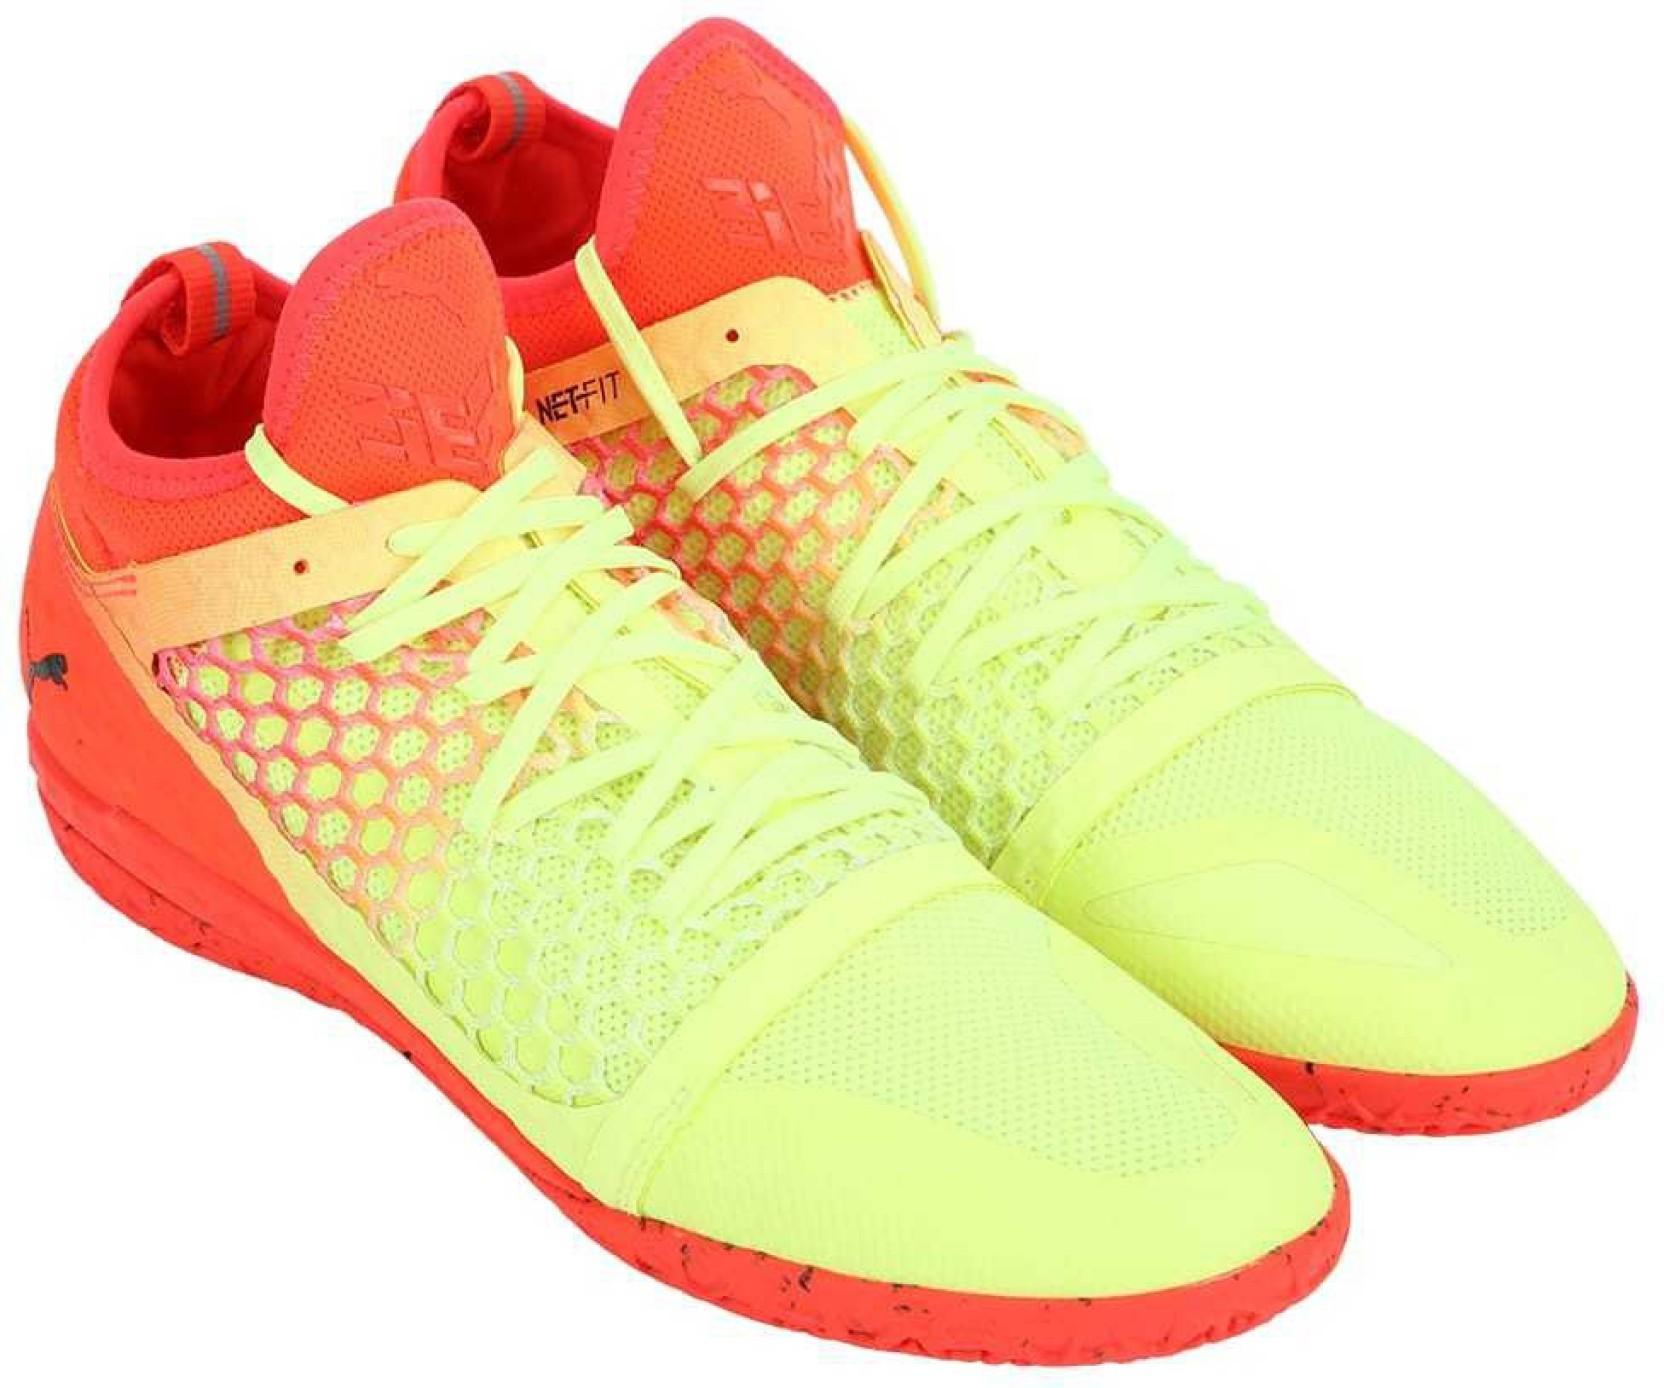 33029ed612ca Puma 365 IGNITE NETFIT CT Football Shoes For Men - Buy Puma 365 ...